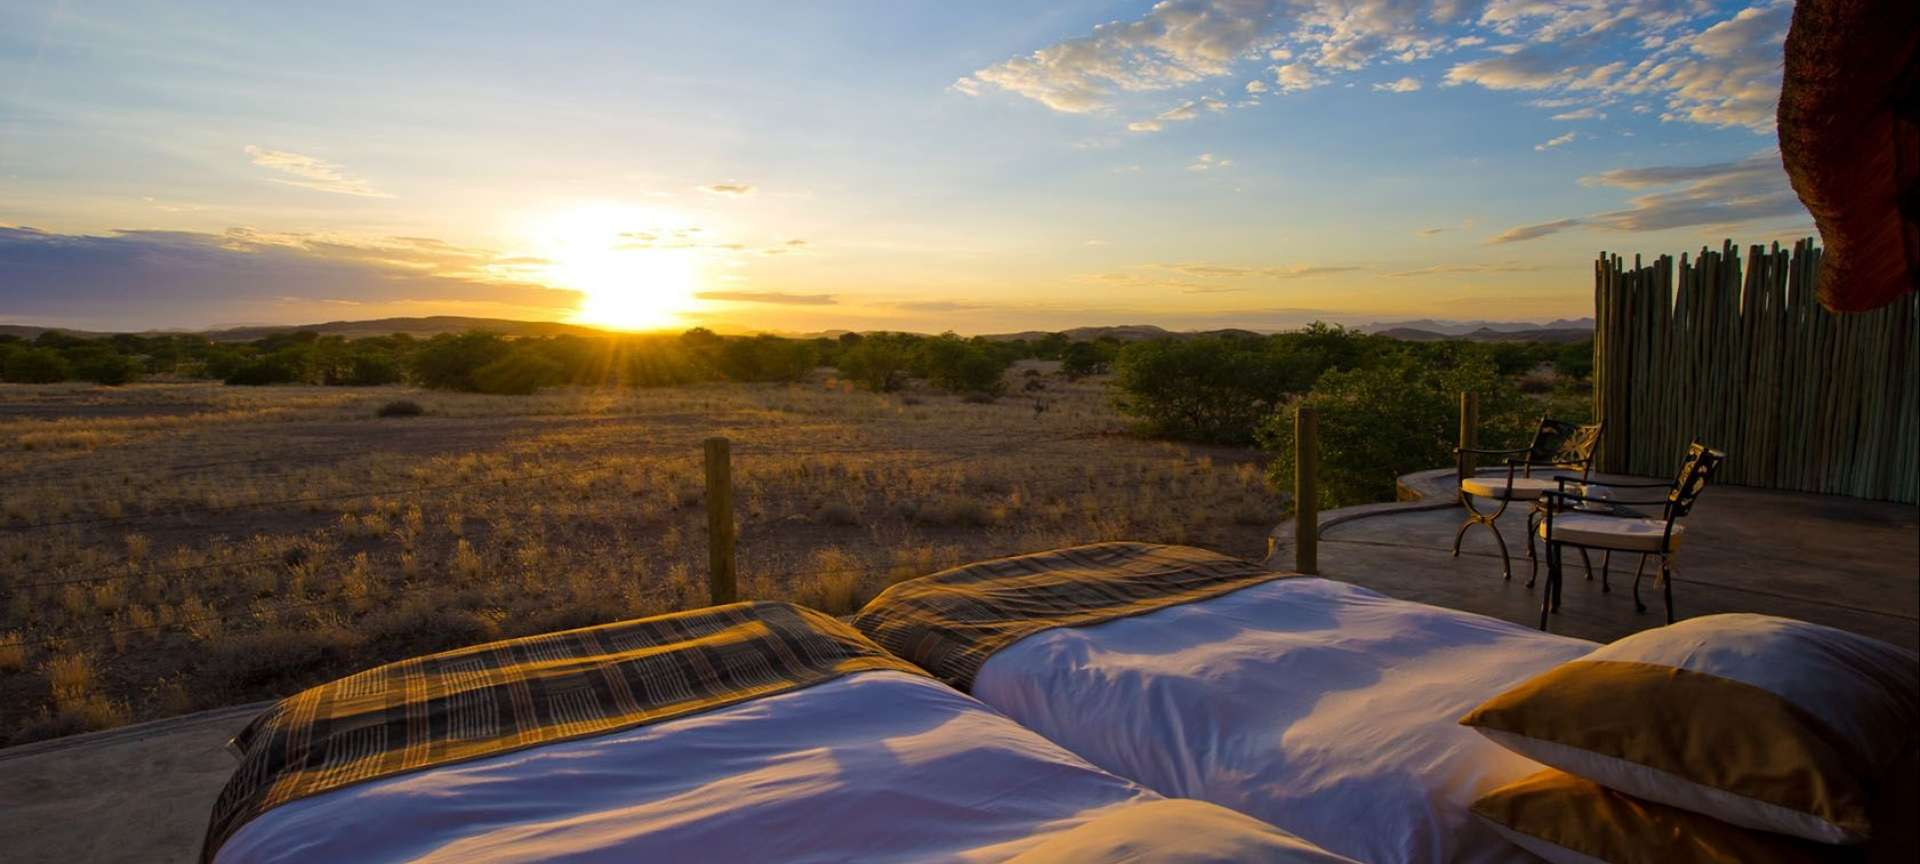 Luxury safaris in Namibia - Africa Wildlife Safaris